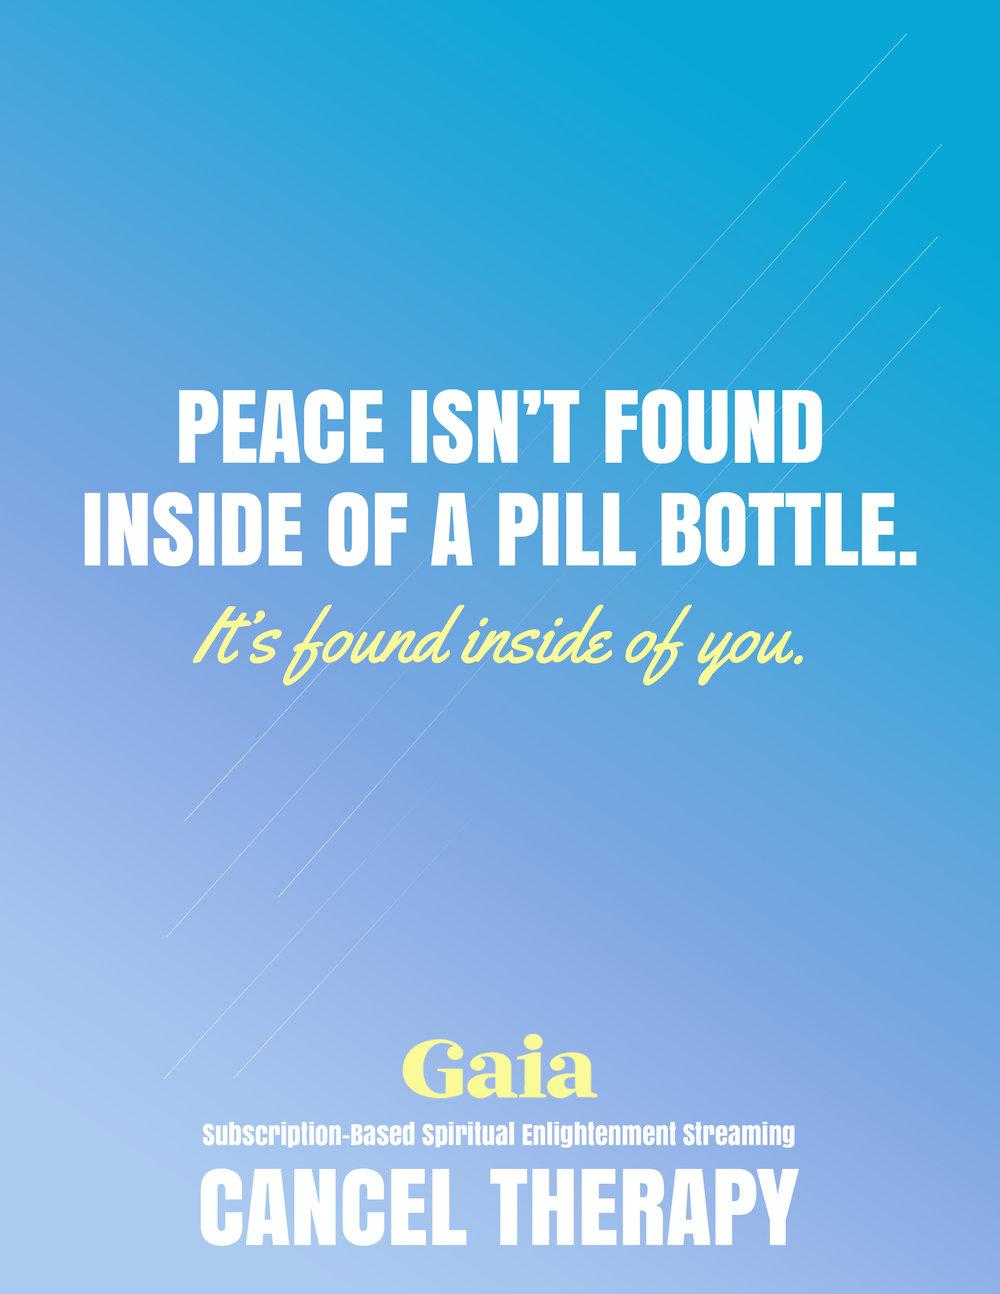 Gaia — Sandi Spino - Copywriter